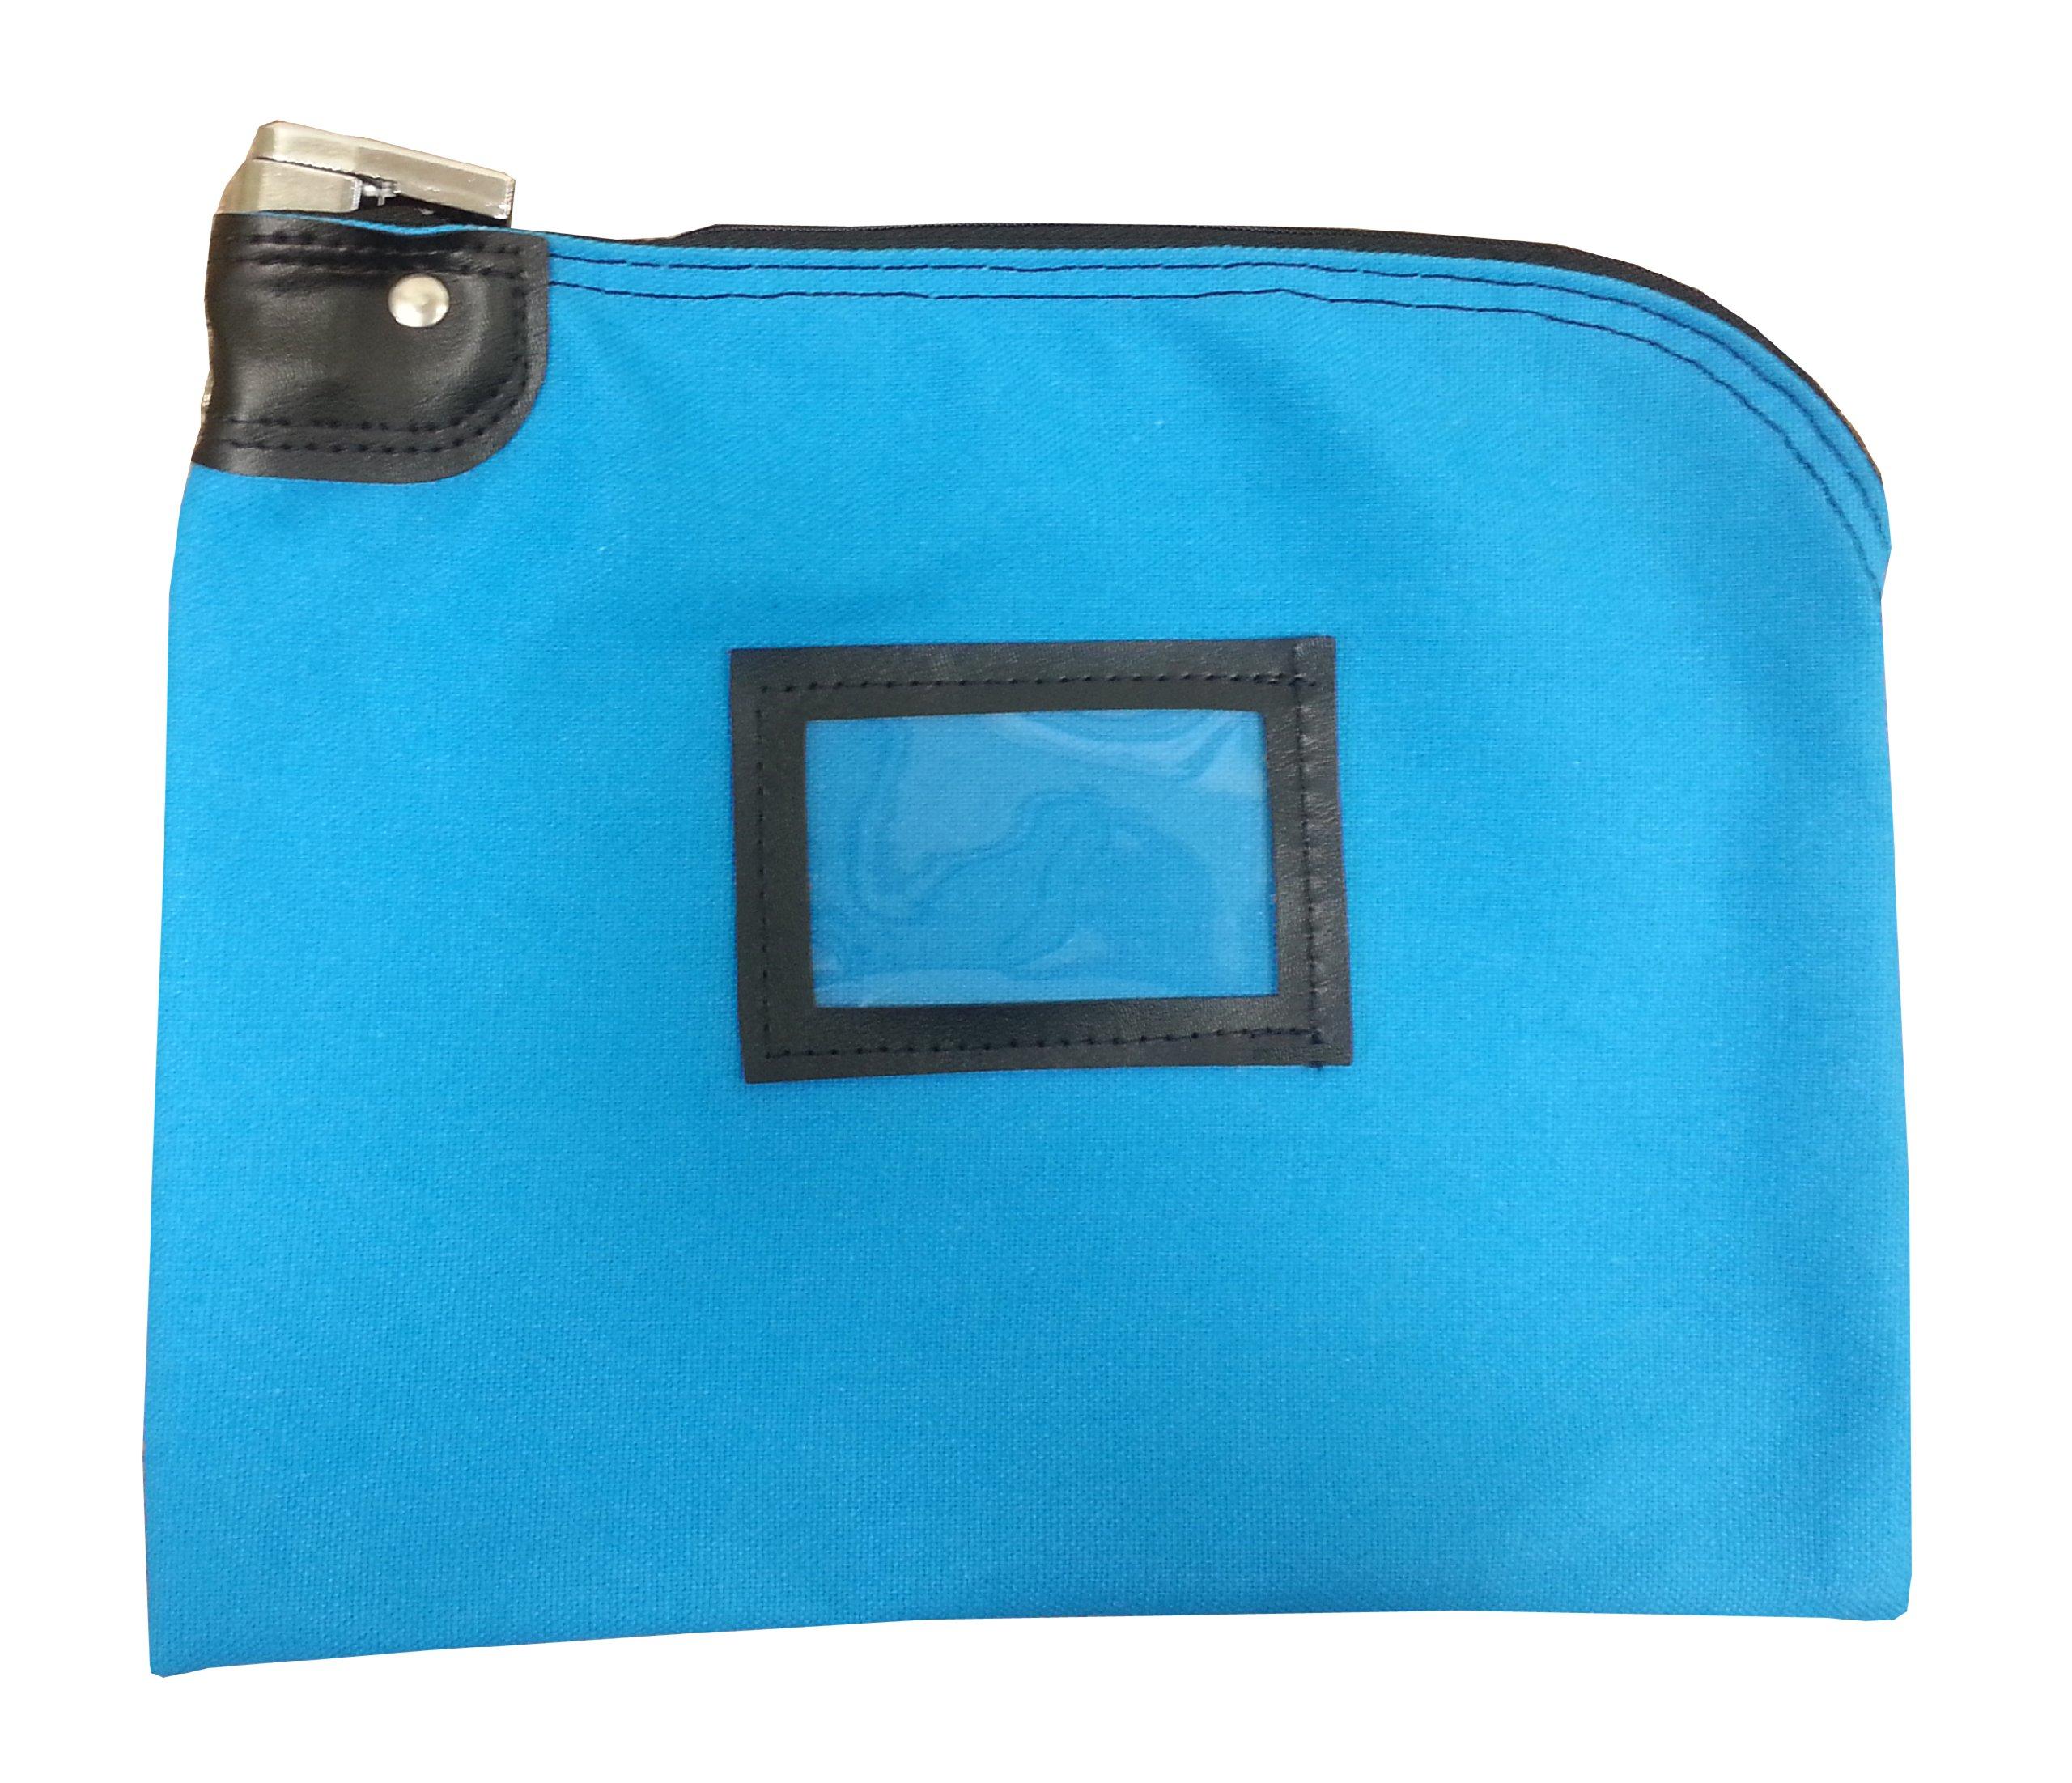 Locking Bank Bag Canvas Keyed Security Deep Sky Blue